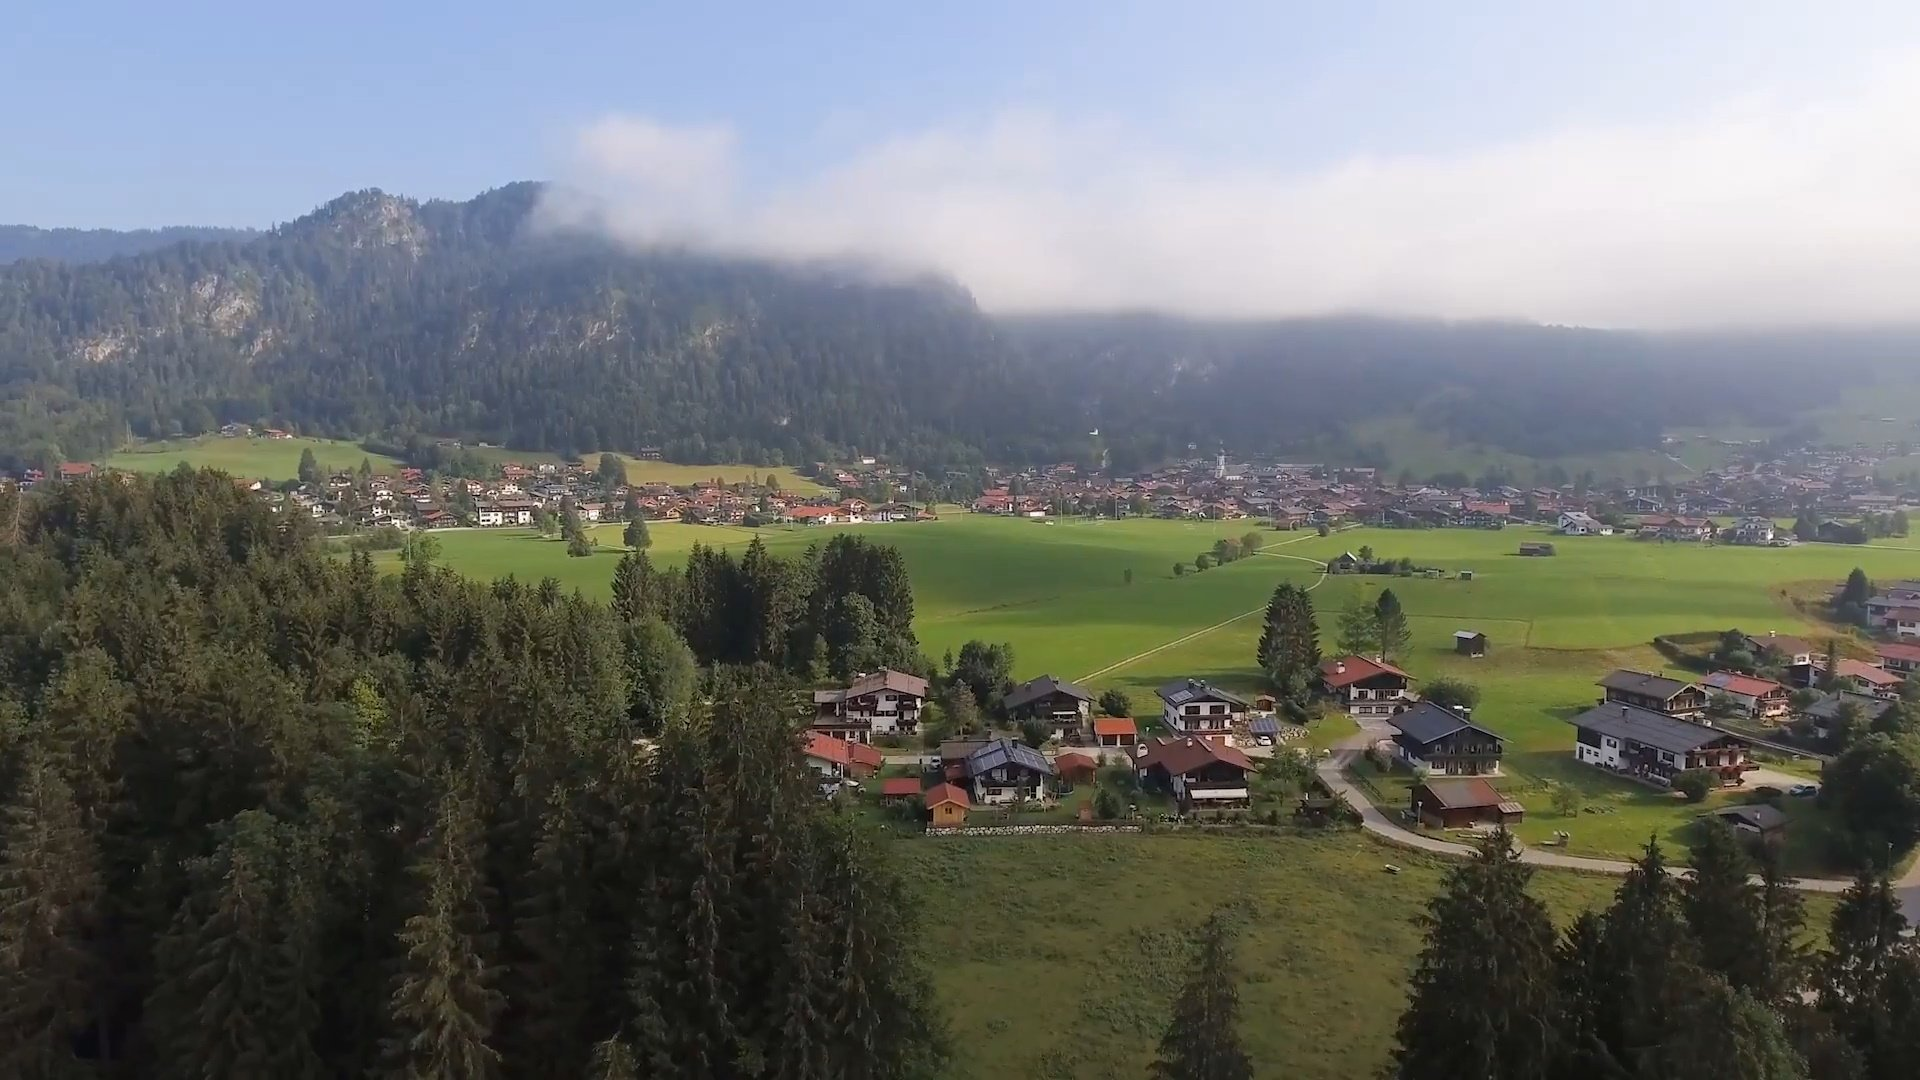 Reit im Winkl - Chiemsee-Chiemgau Drohnenaufnahme